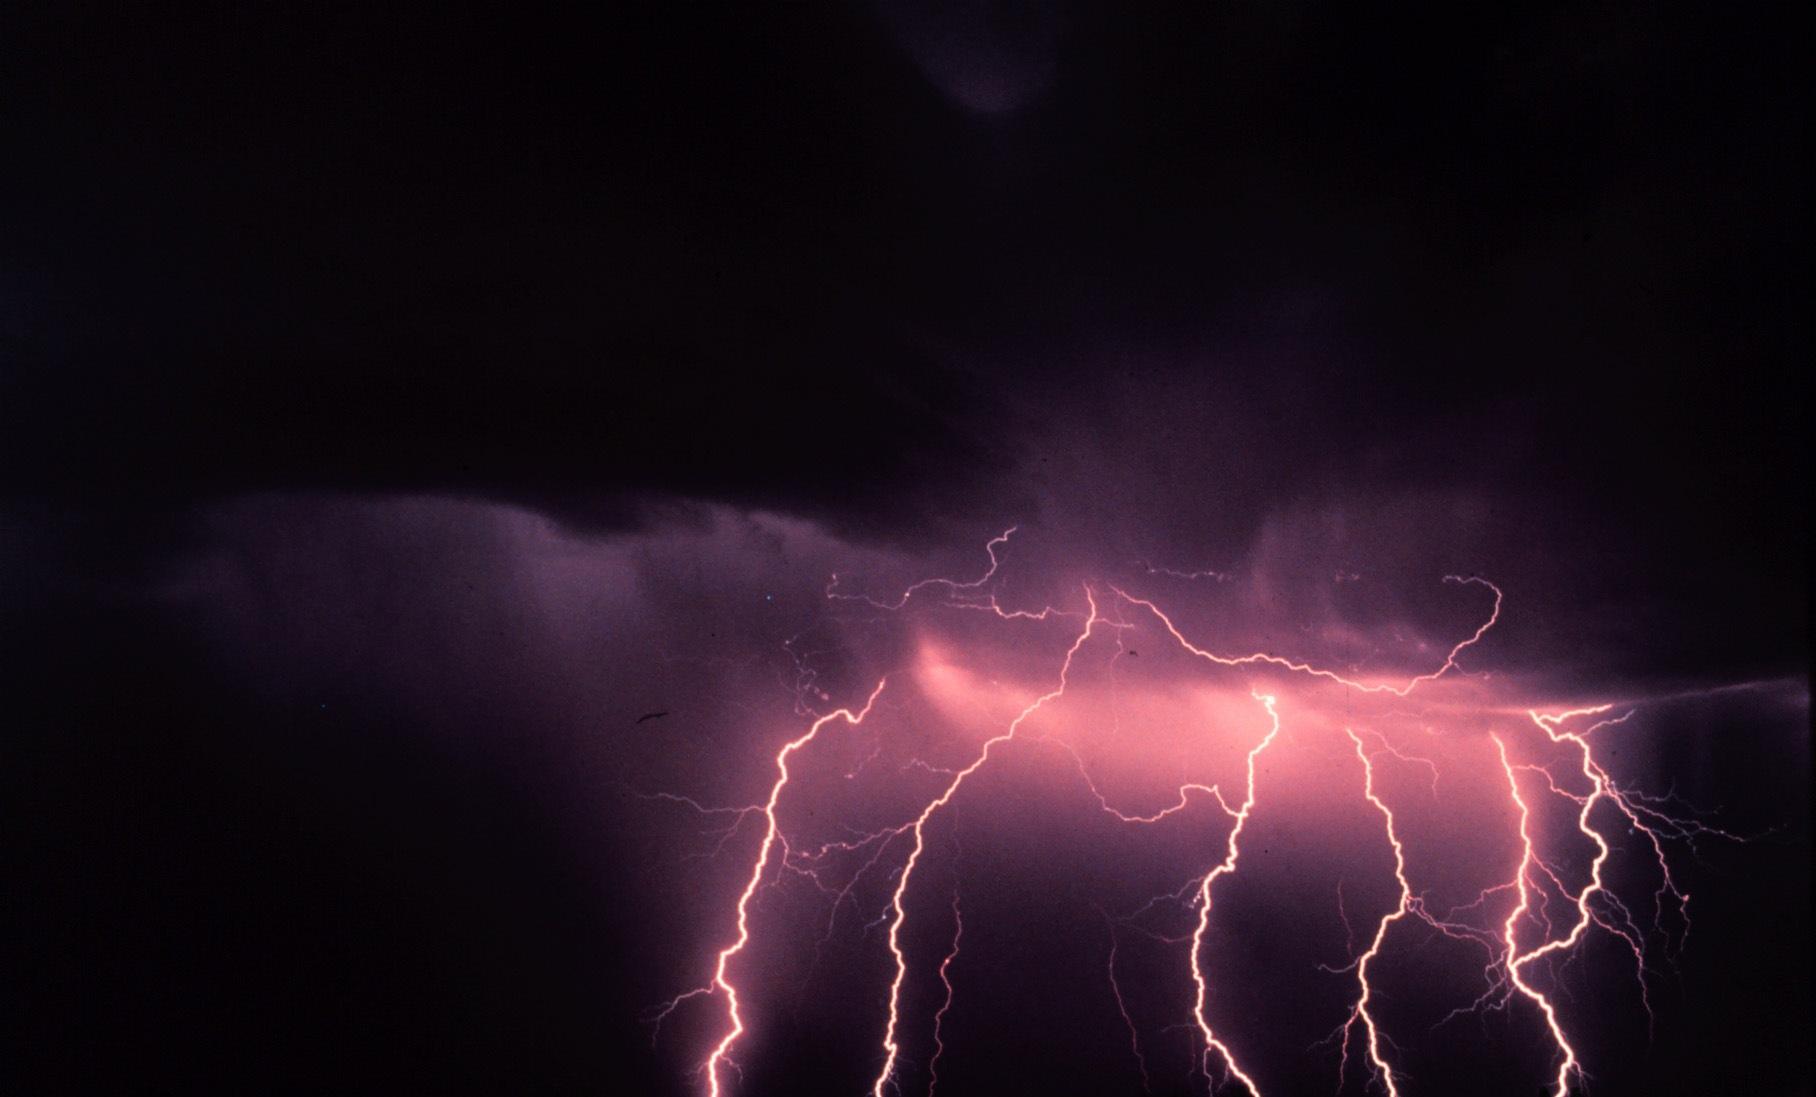 Dark Purple Sky Lighting   1816 x 1097   Download   Close & Dark Purple Sky Lighting Wallpapers - 1816x1097 - 234675